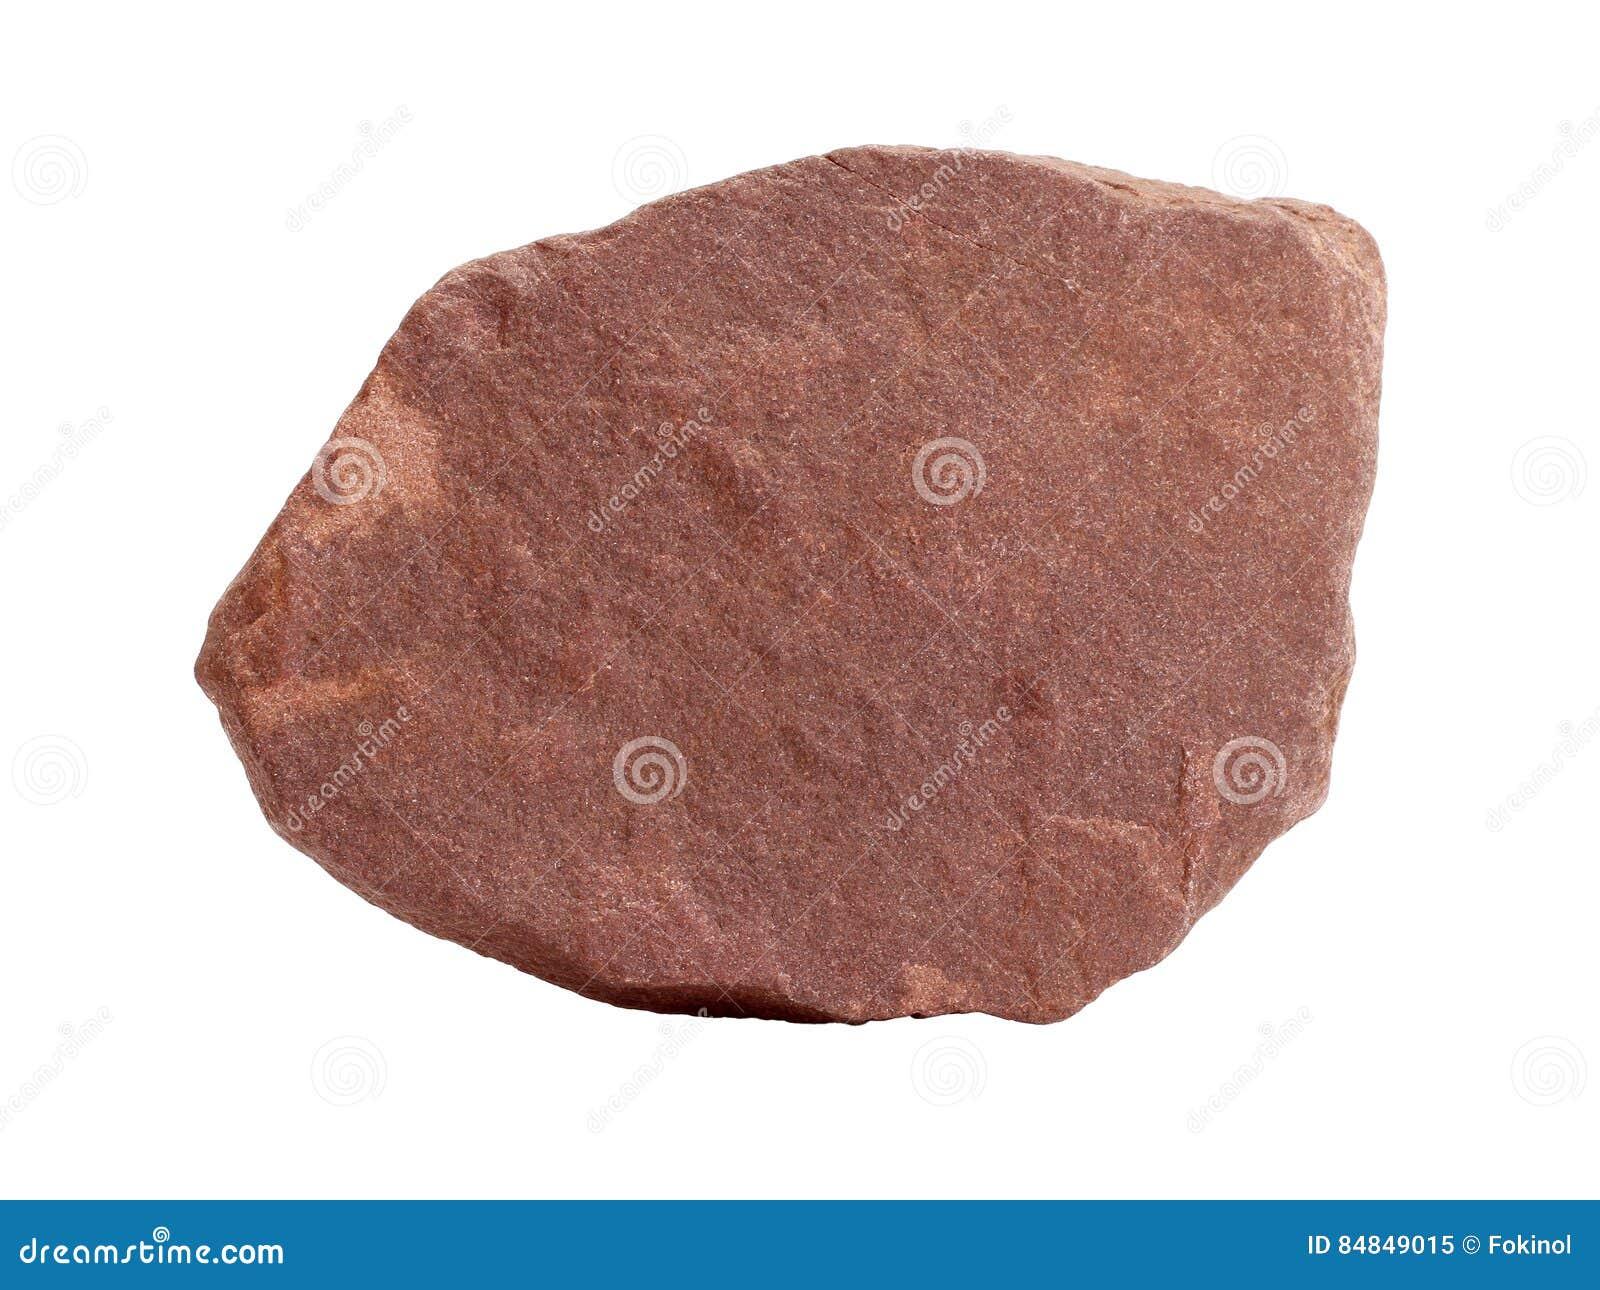 Natural sample of red quartzite slate - metamorphosed sandstone rock